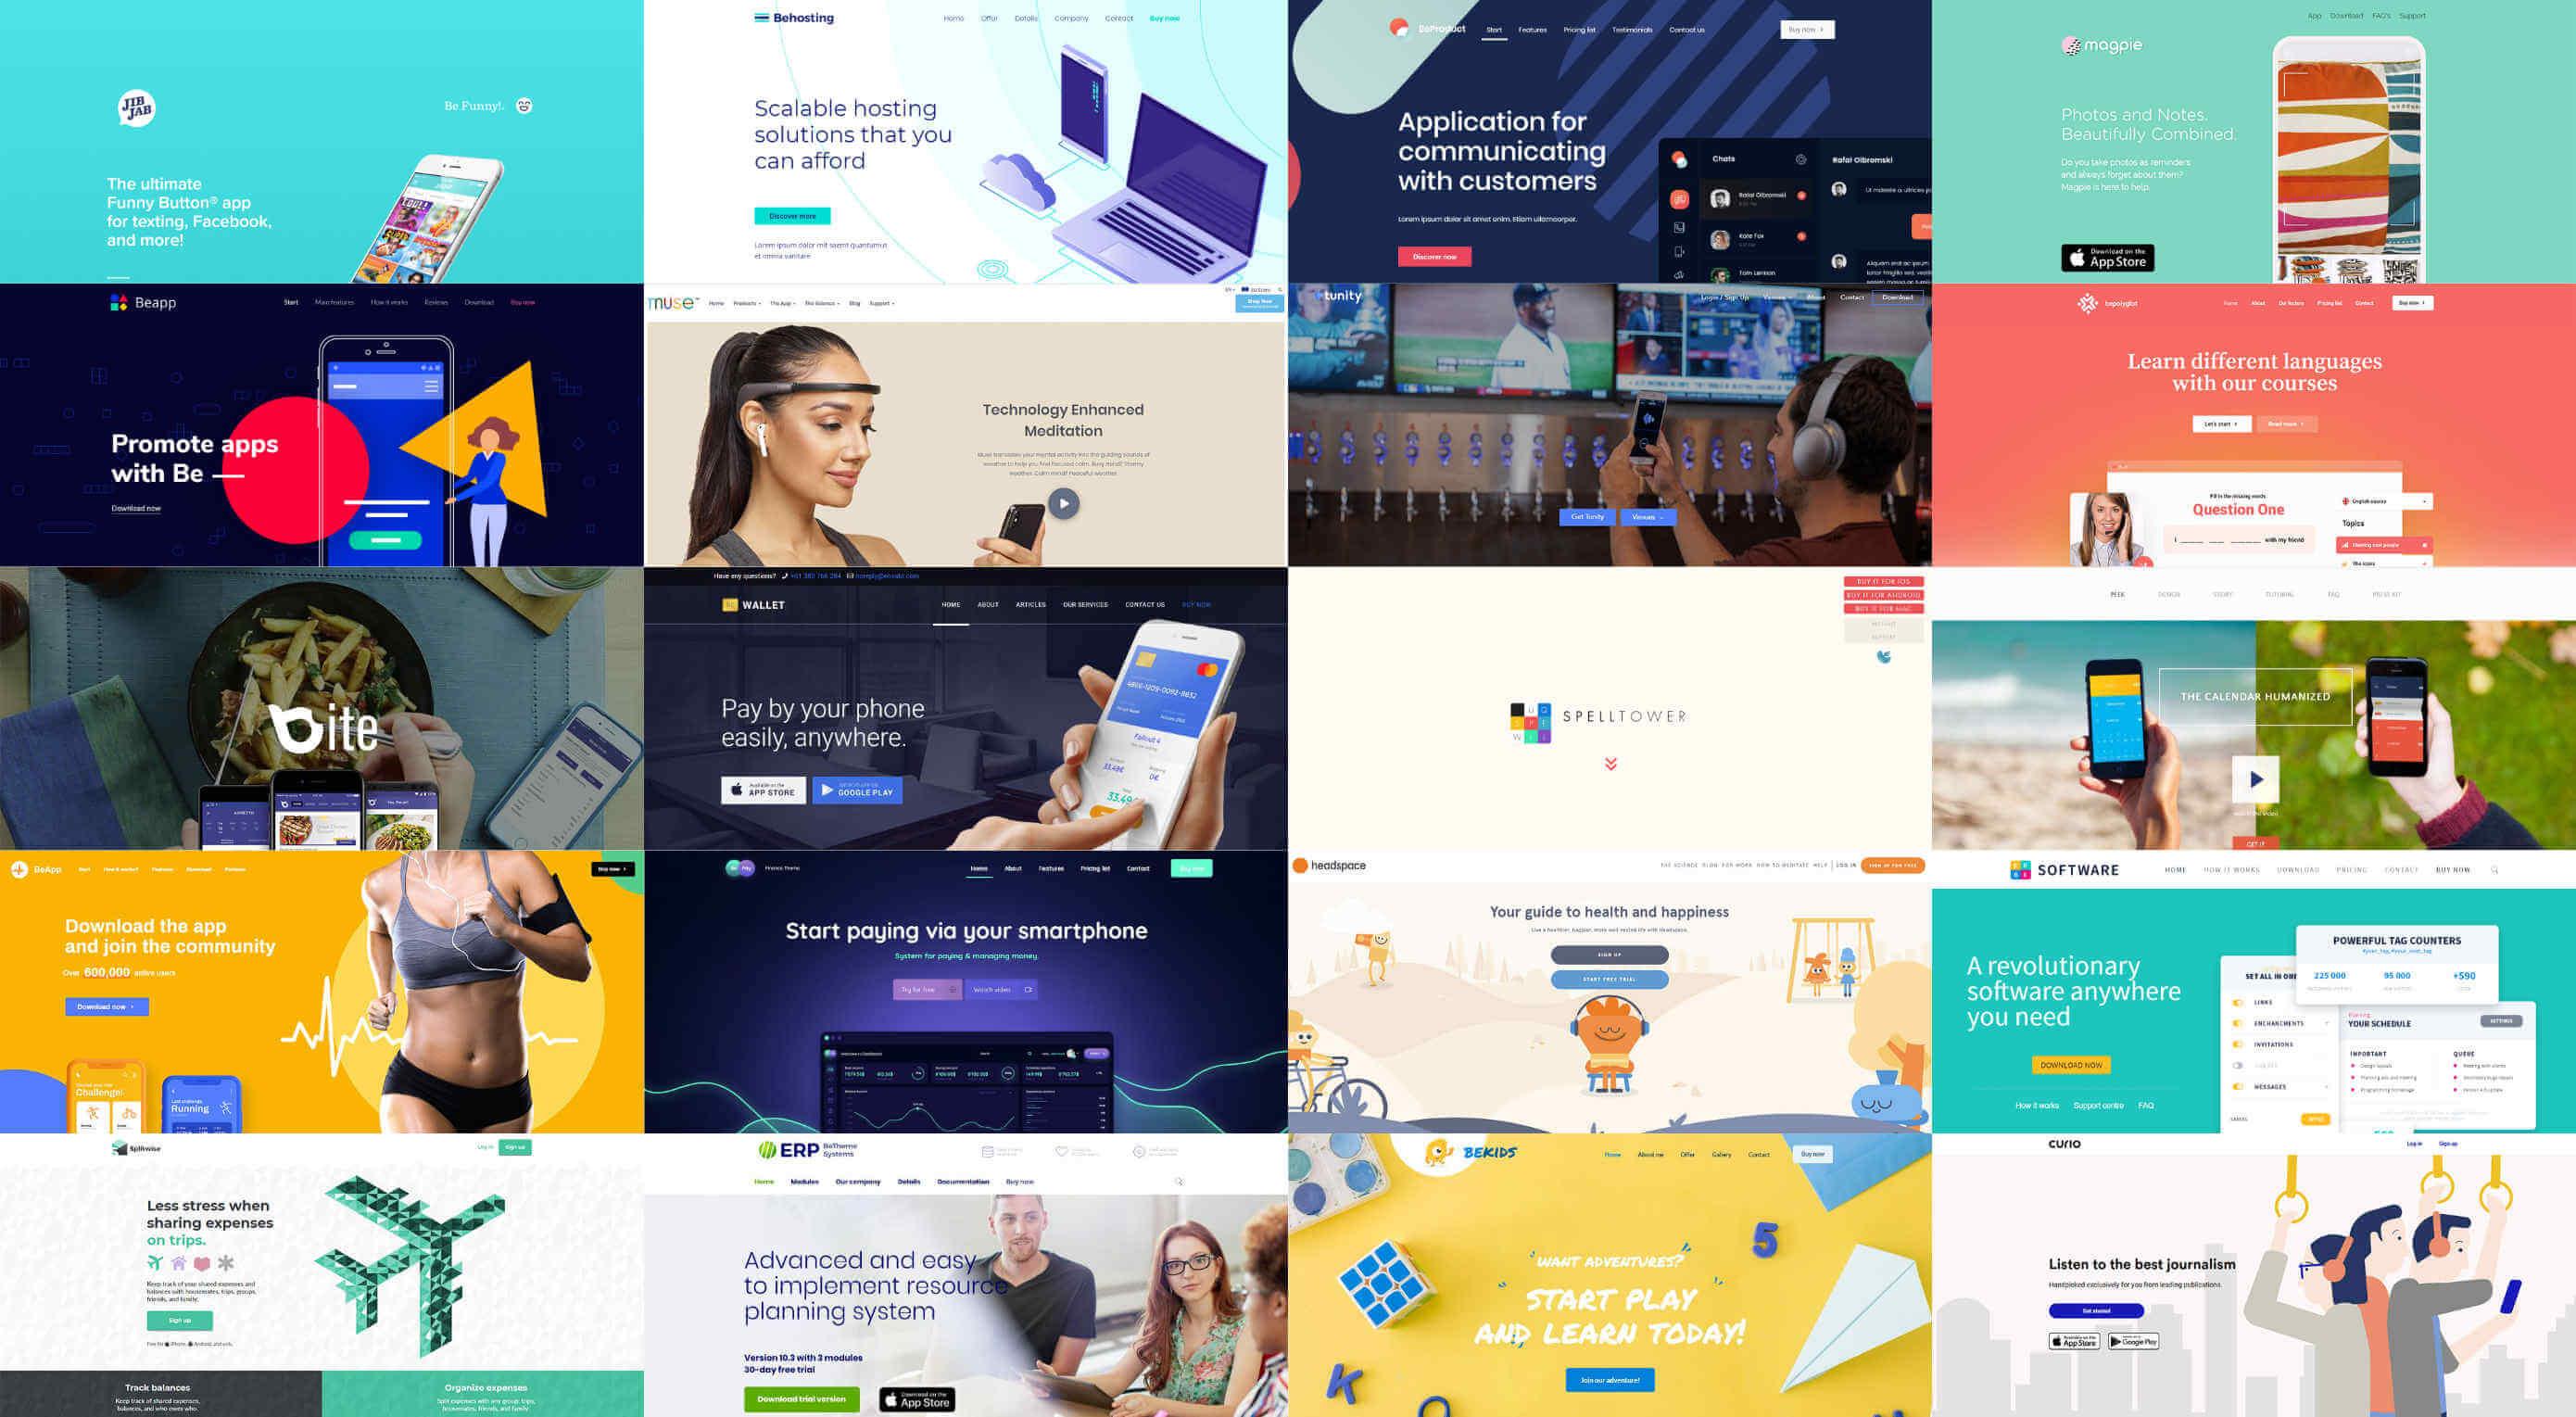 Mobile App Website Inspiration: 20 Application Websites And Tips To Design One